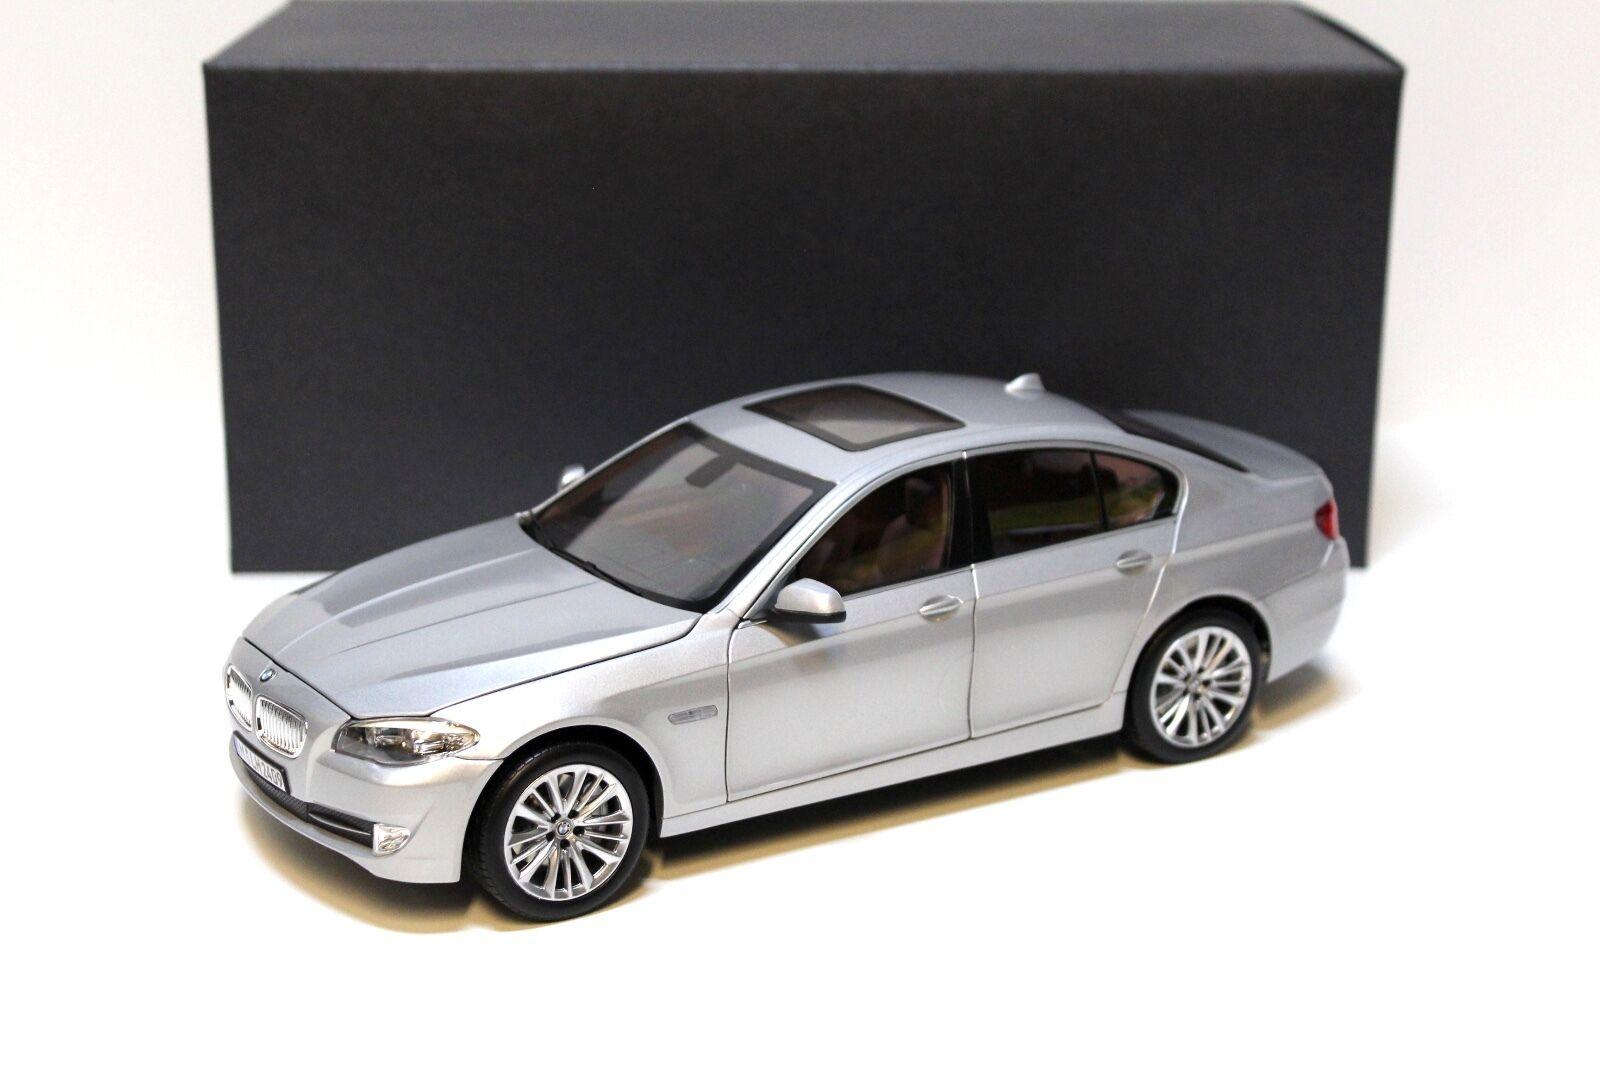 1 18 norev bmw 550i f10 Limousine plata dealer New en Premium-modelCoches